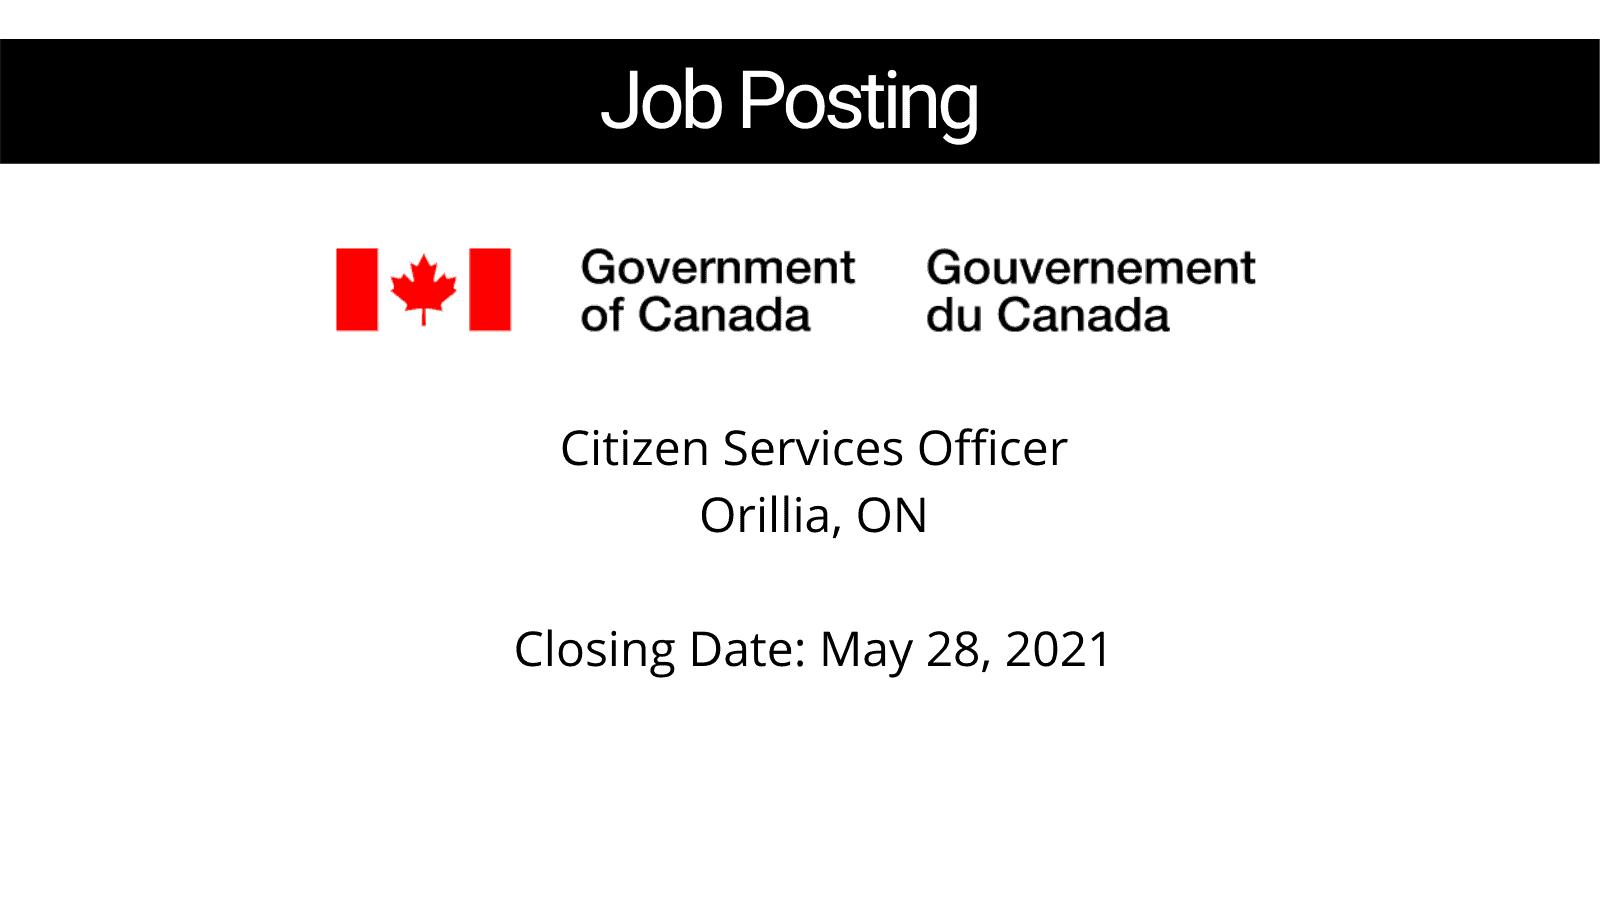 Citizen Services Officer